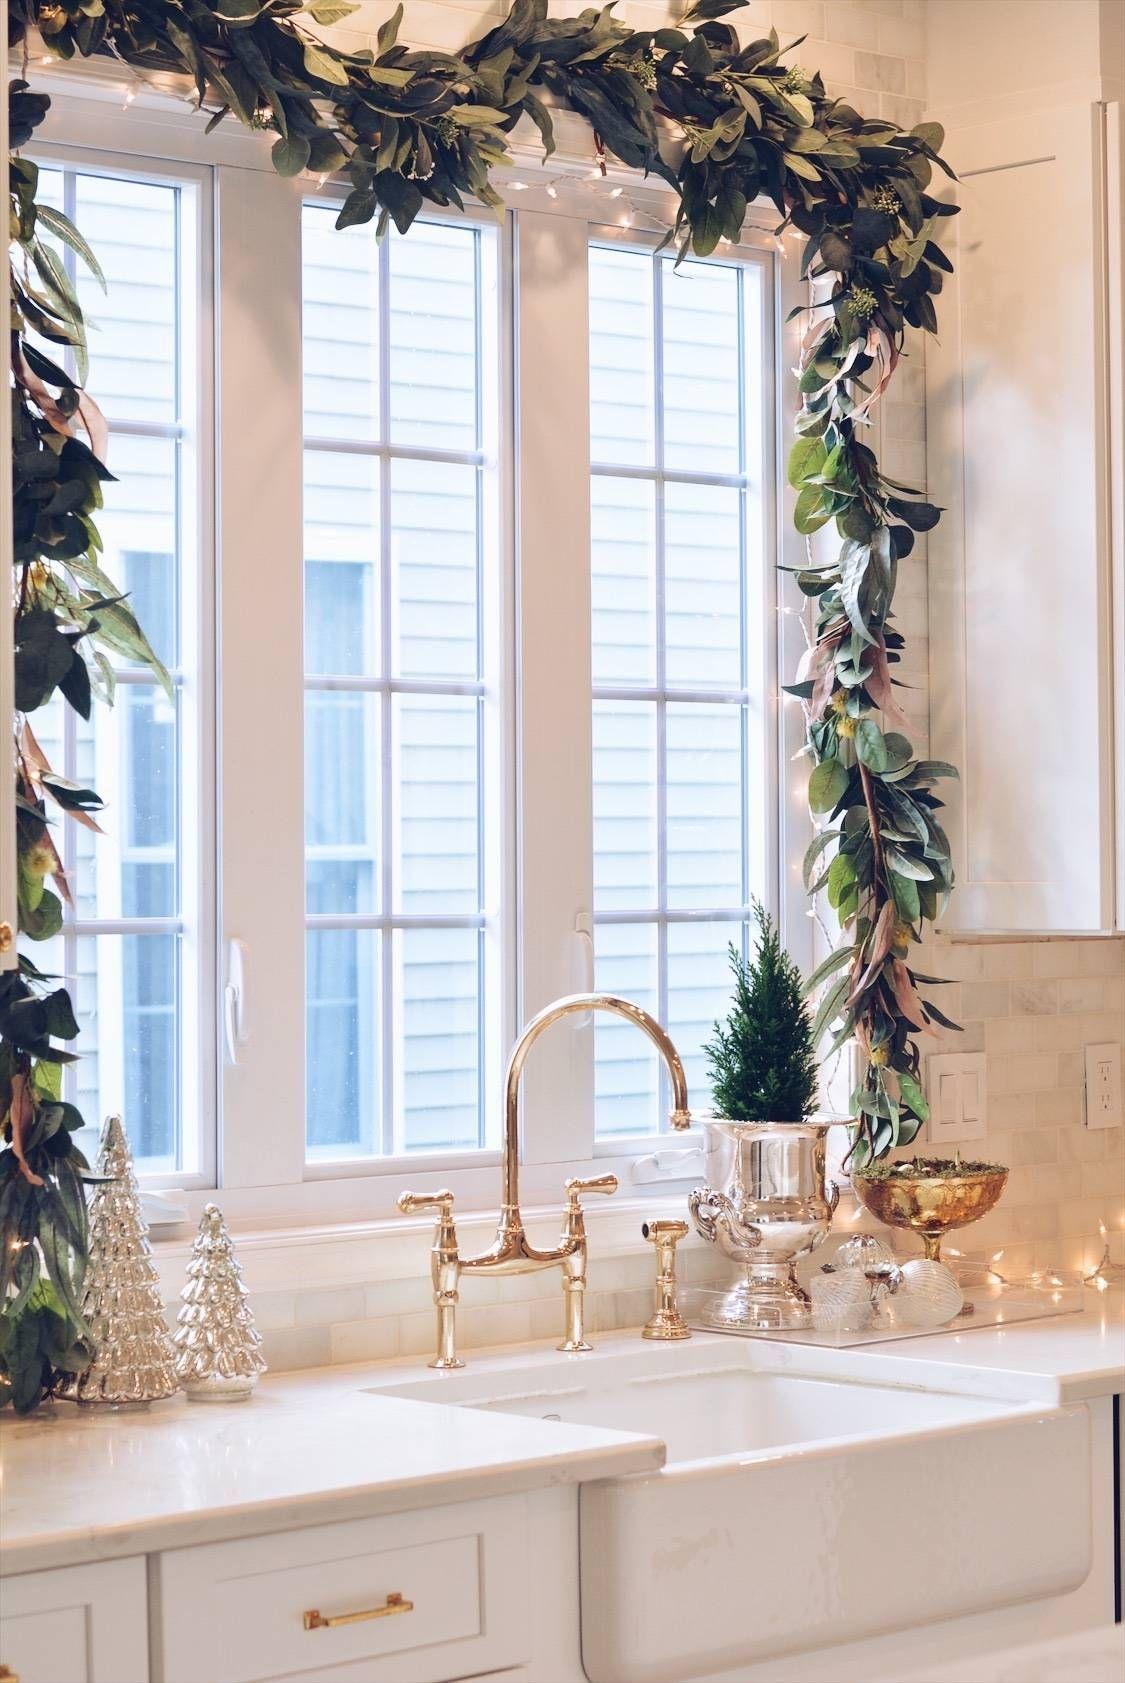 christmas kitchen decor nostalgic christmas decorations santa decorations christmas diy and on kitchen xmas decor id=39290